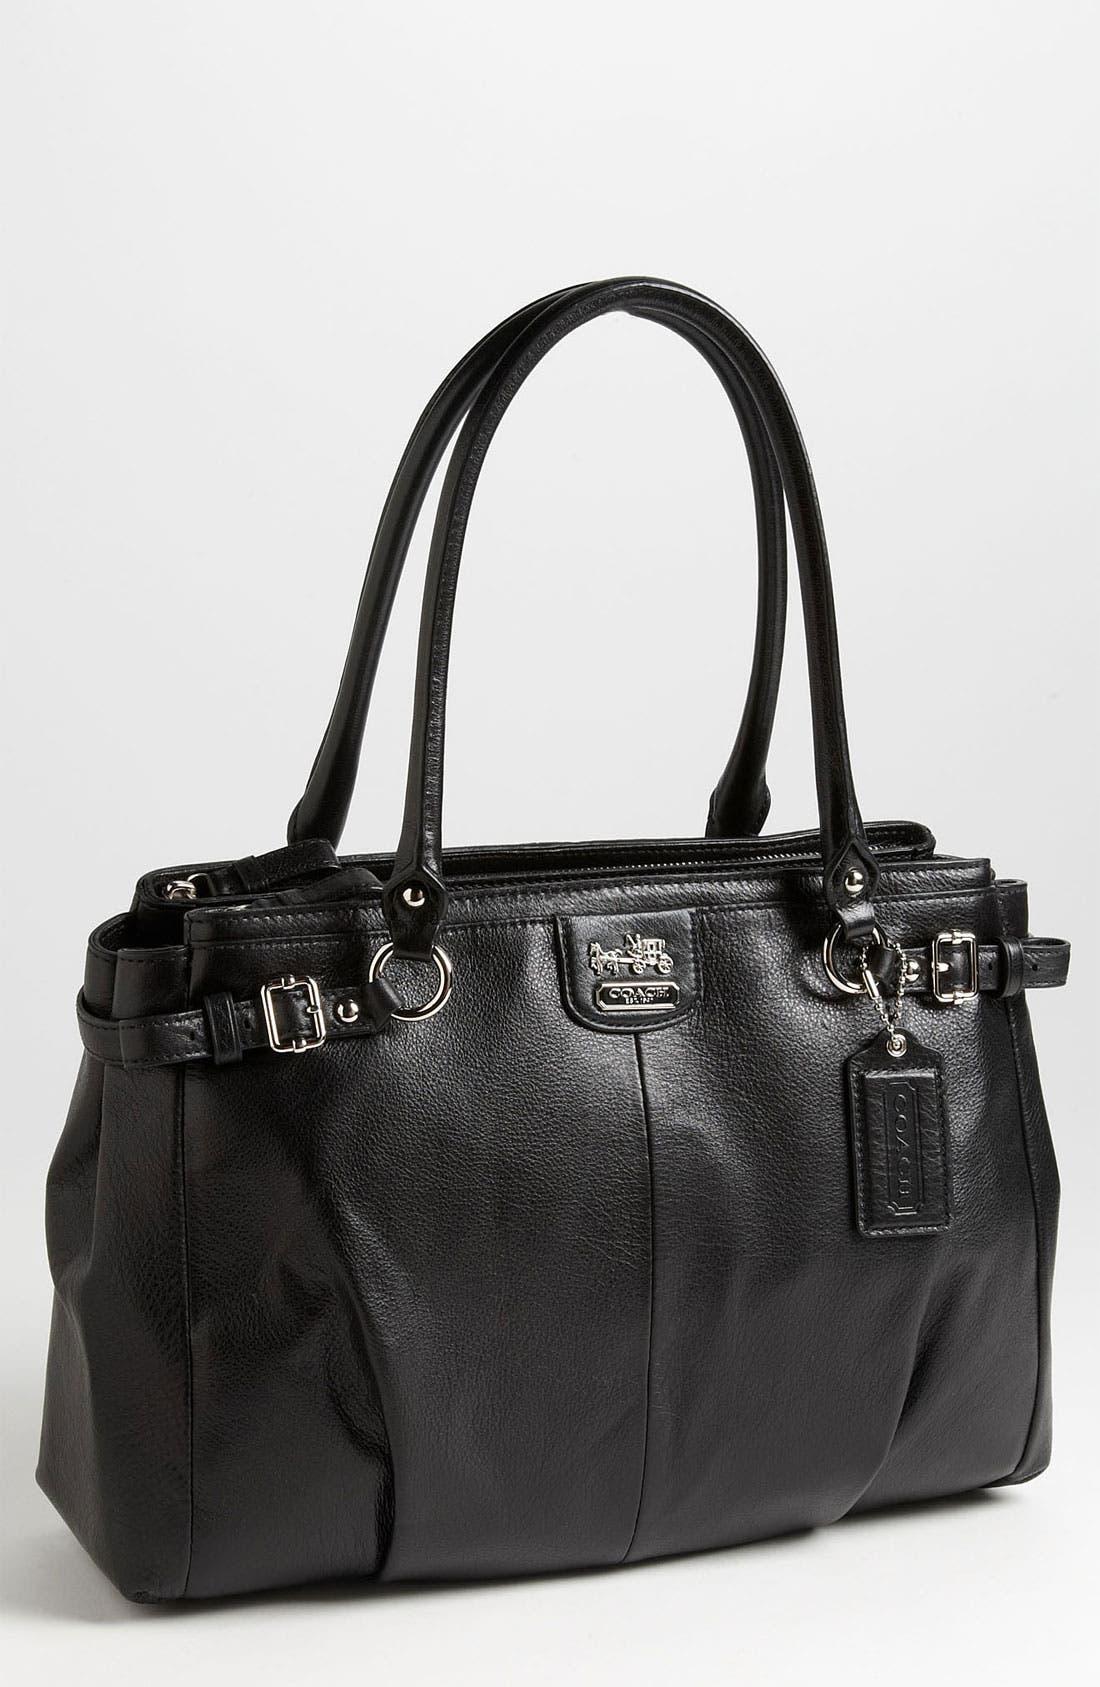 Main Image - COACH 'Madison - Kara' Leather Carryall